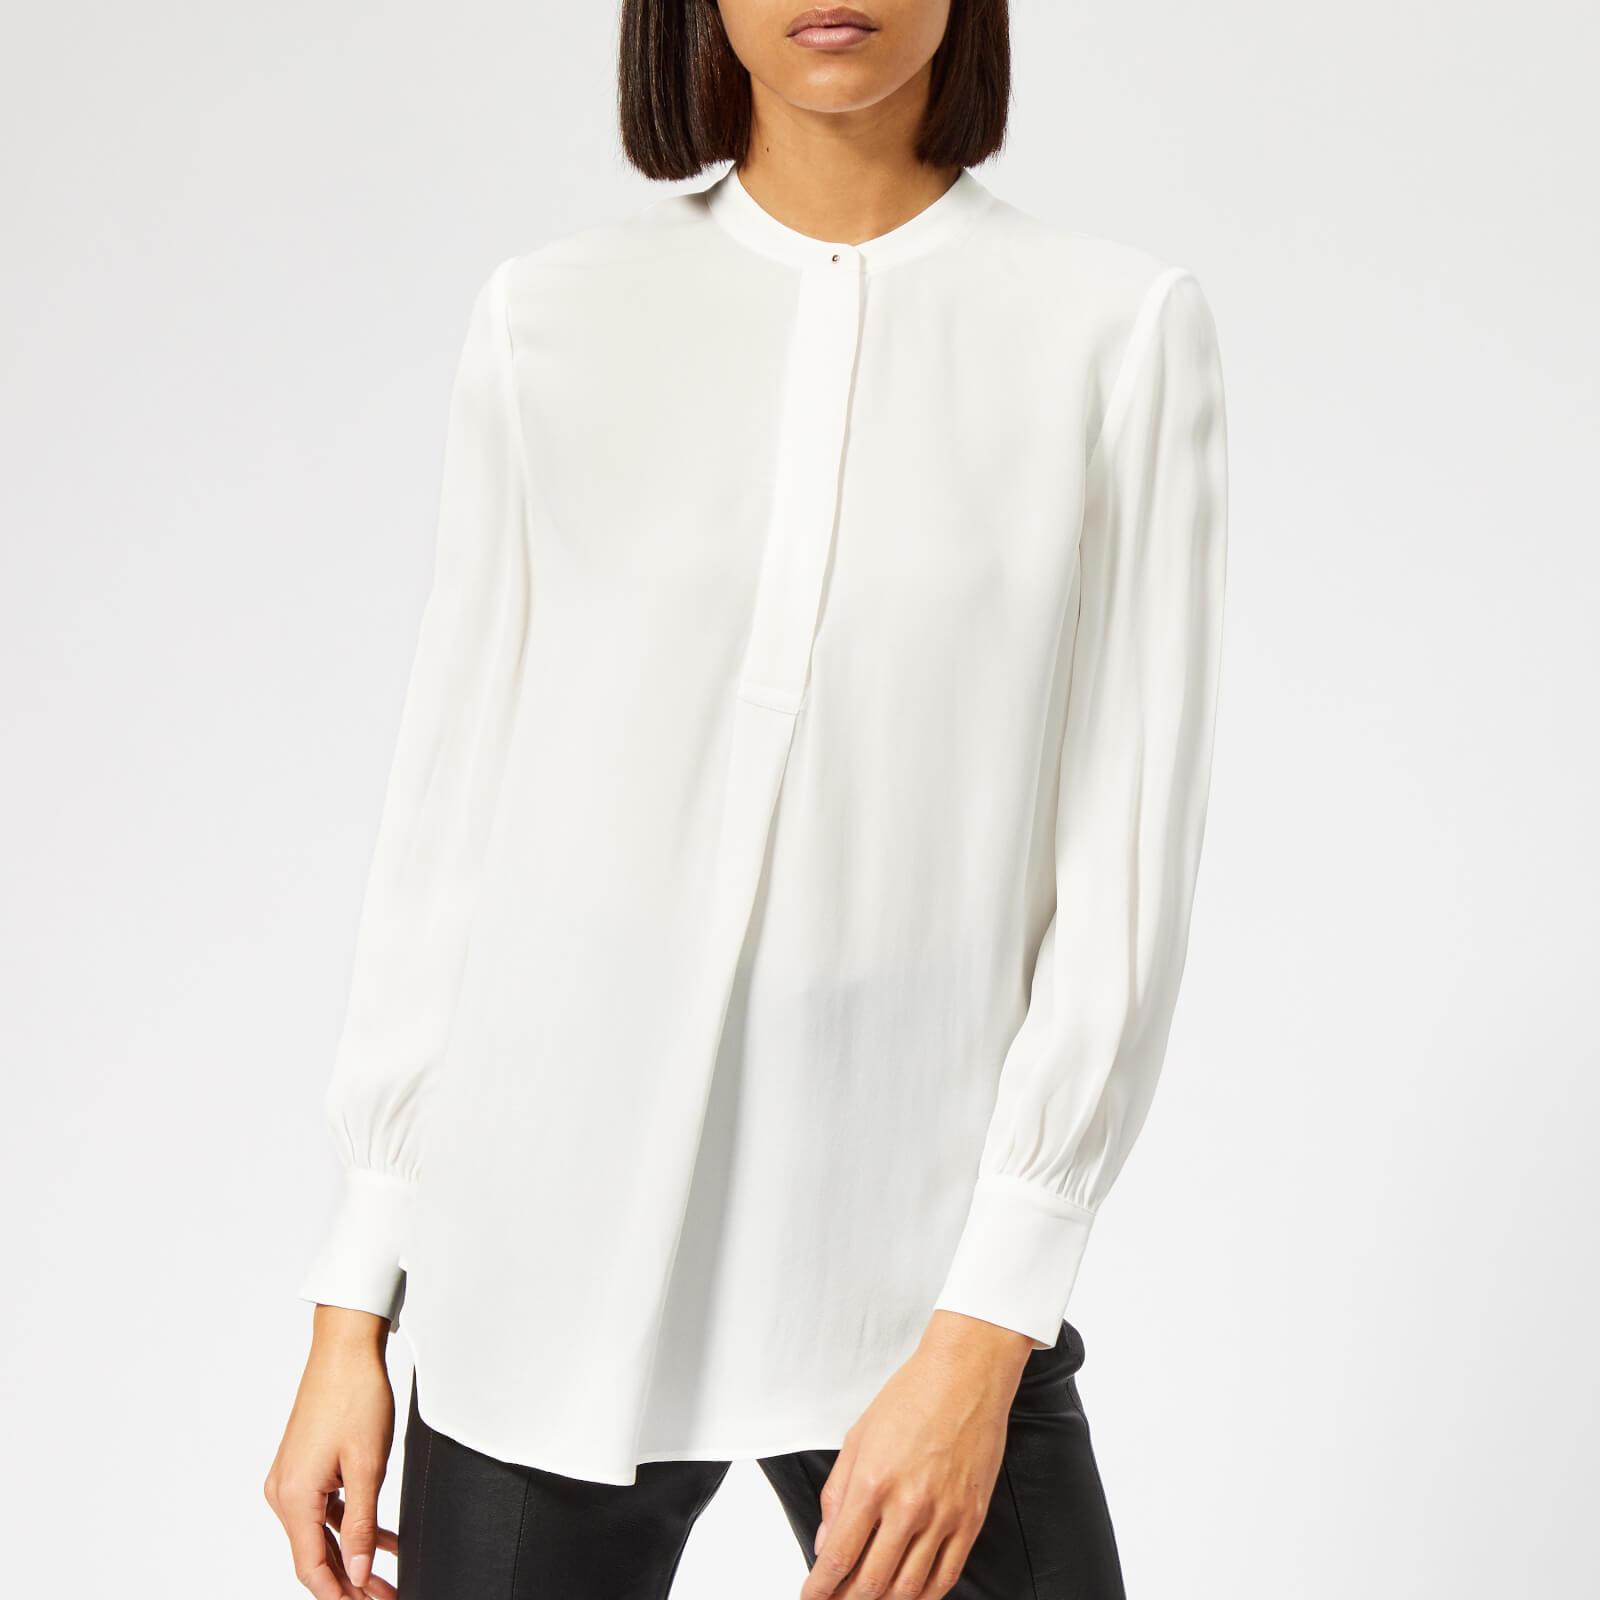 Whistles Women's Stud Pleat Blouse - Ivory - UK 6 - Cream